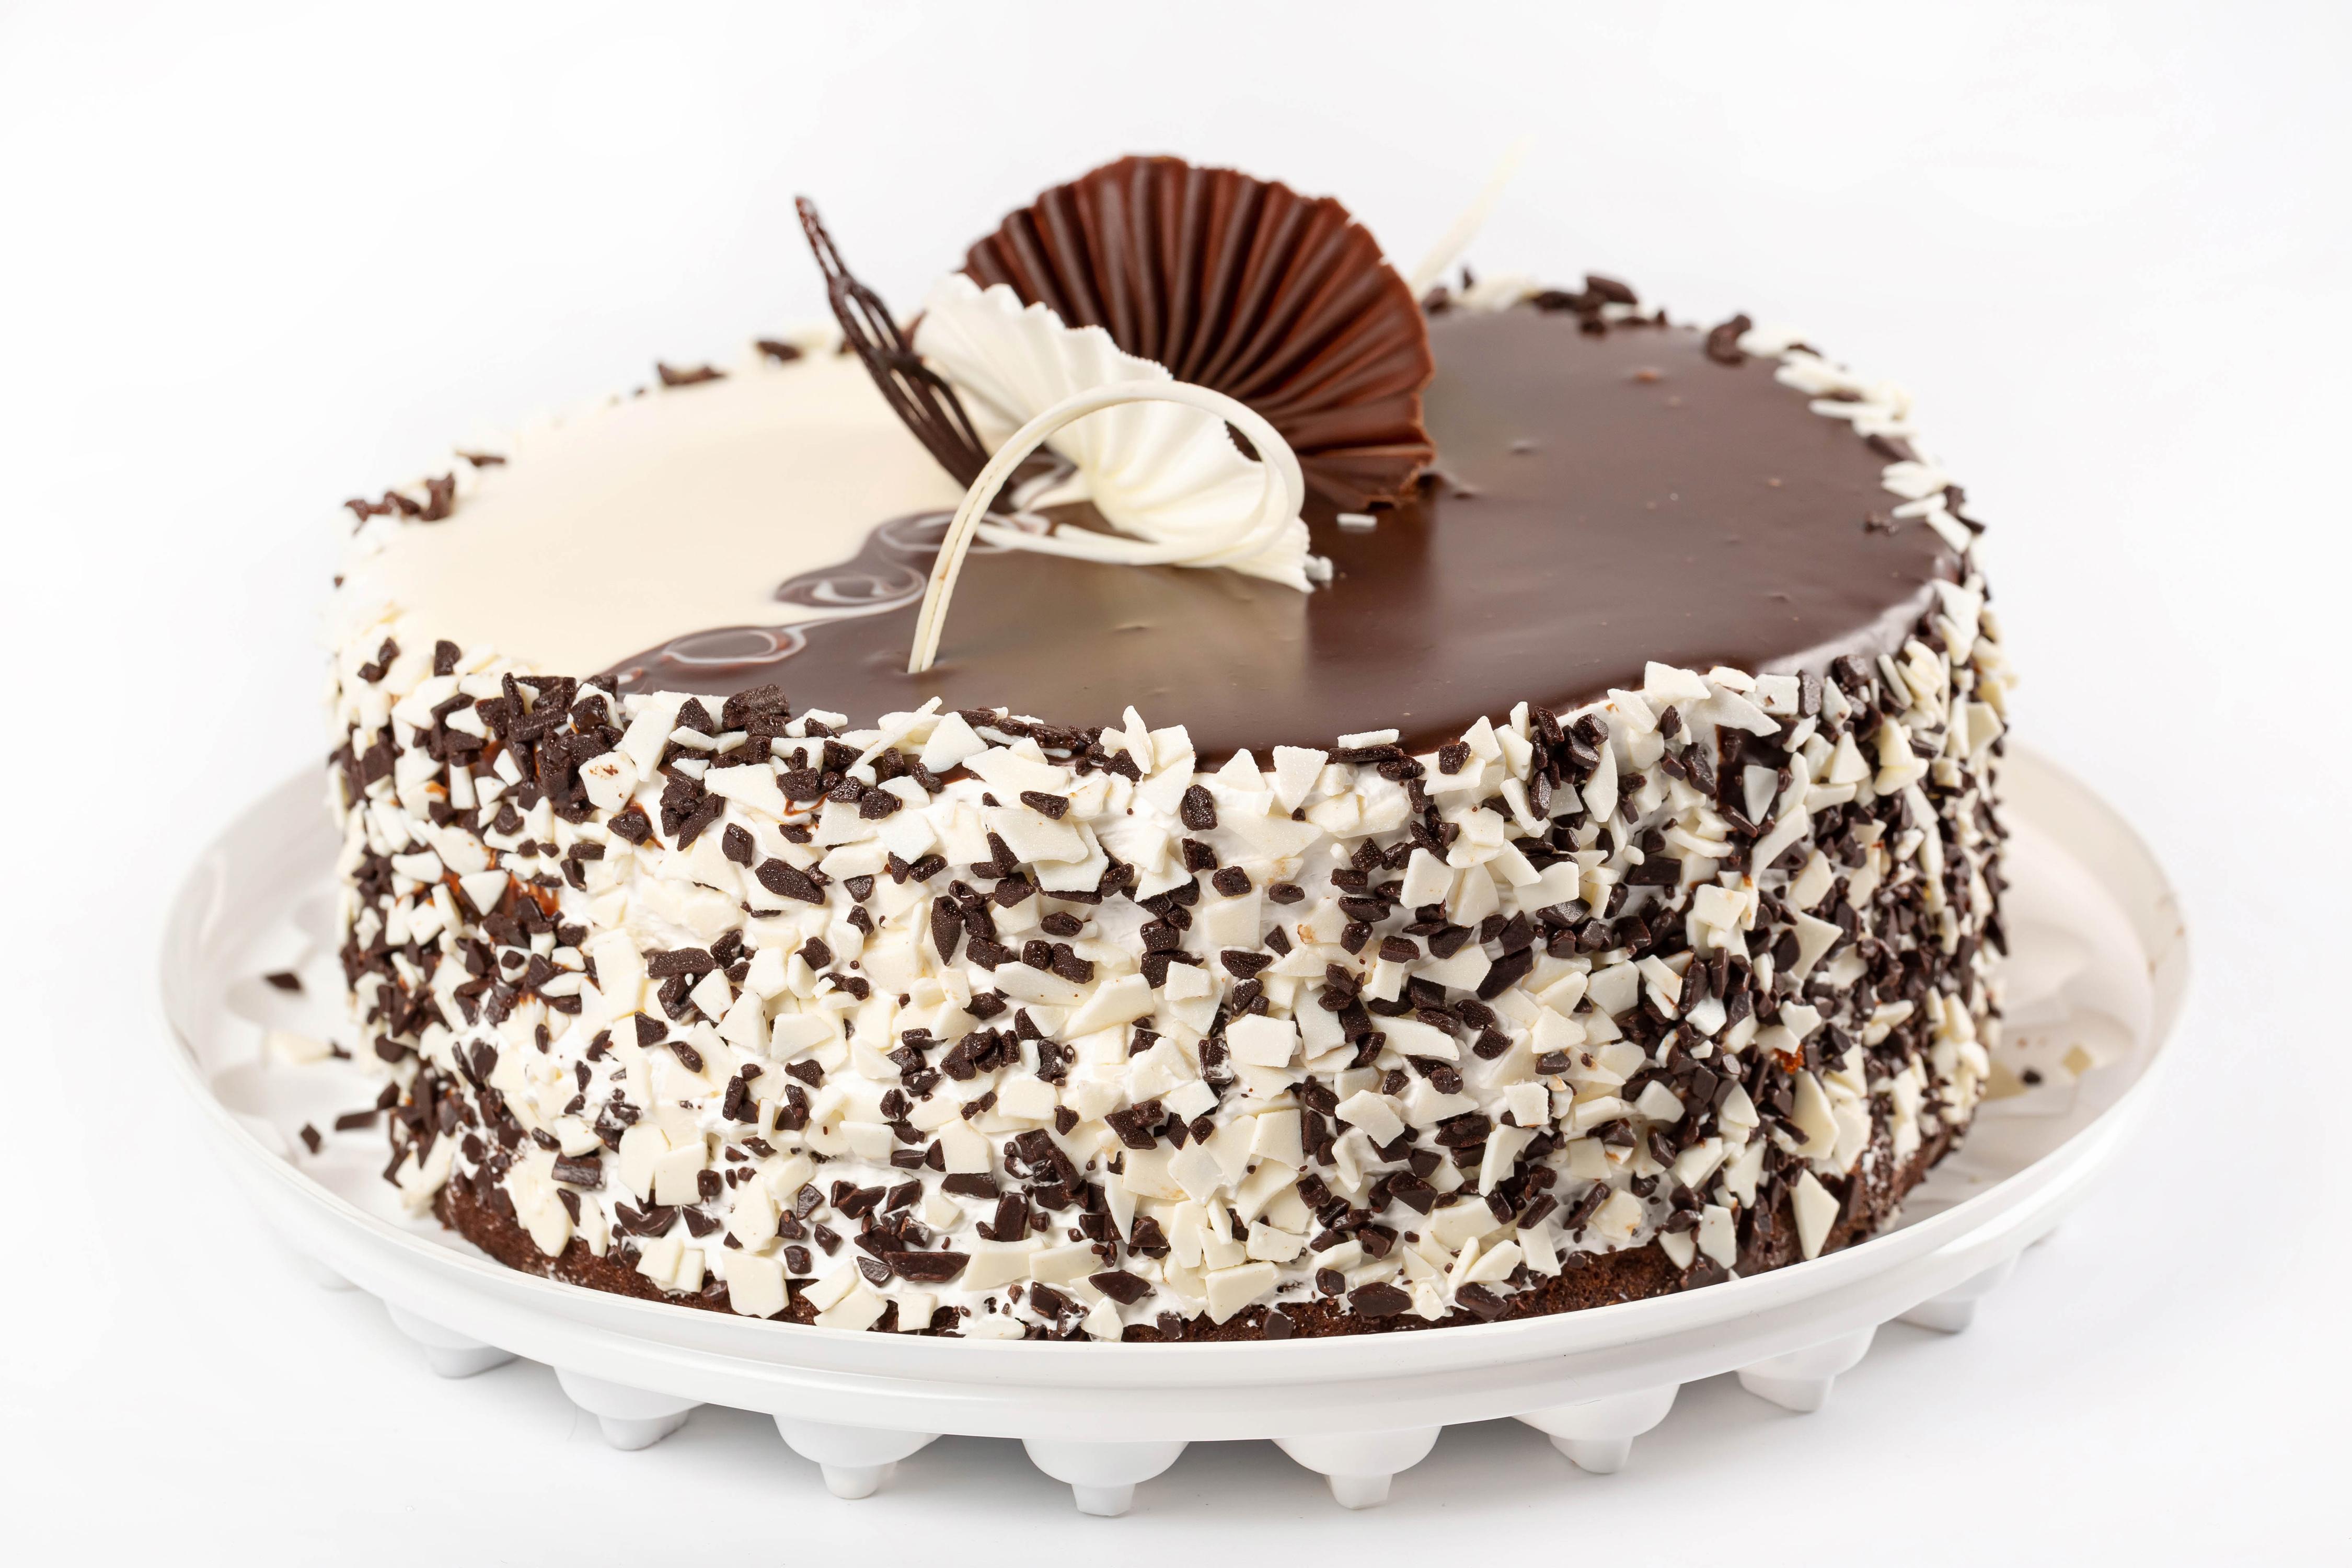 4500x3000 Bolo Chocolate Fundo branco Design comida Alimentos